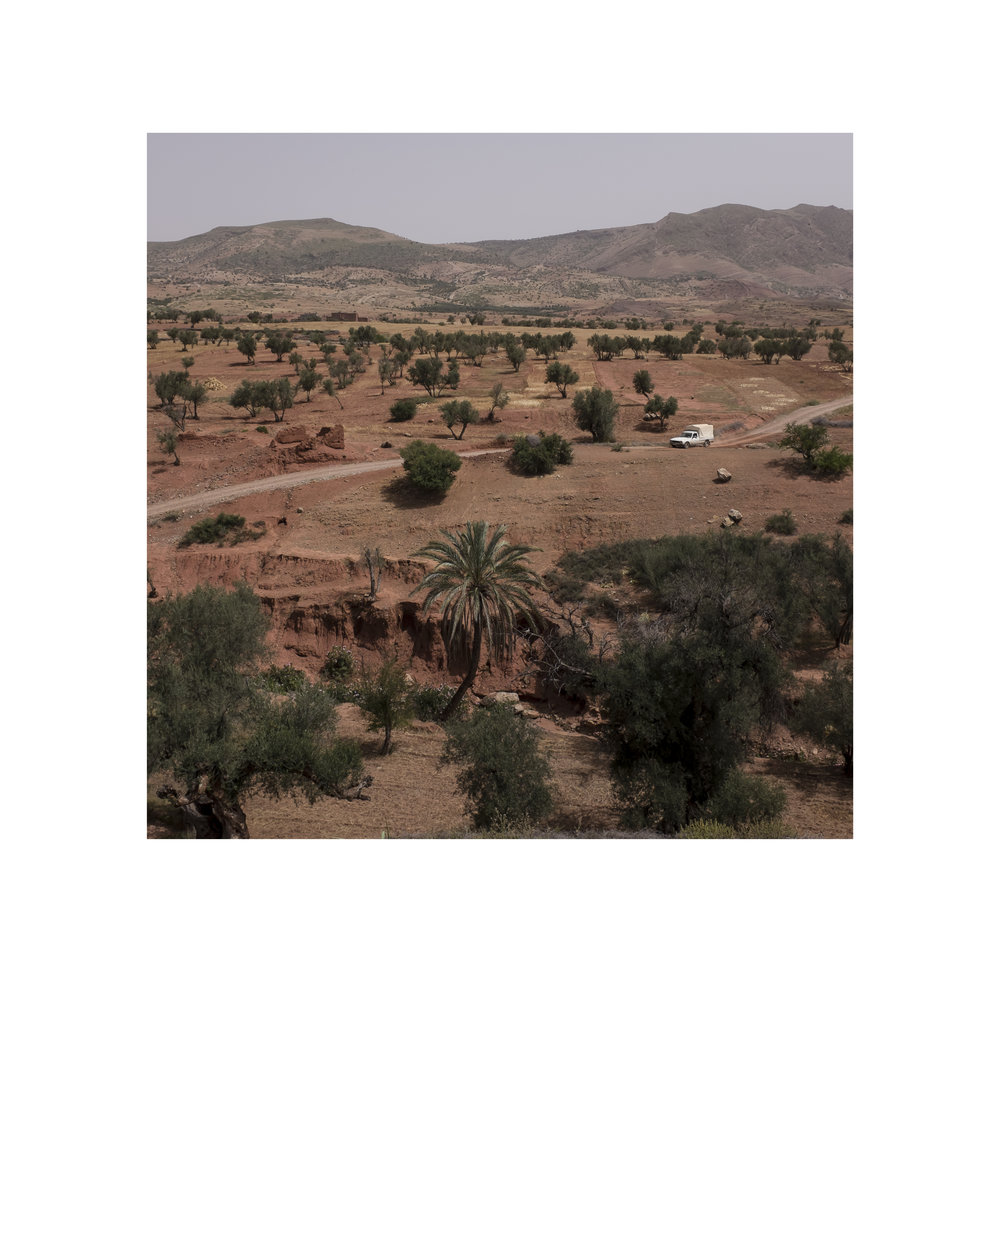 Maroc12.jpg